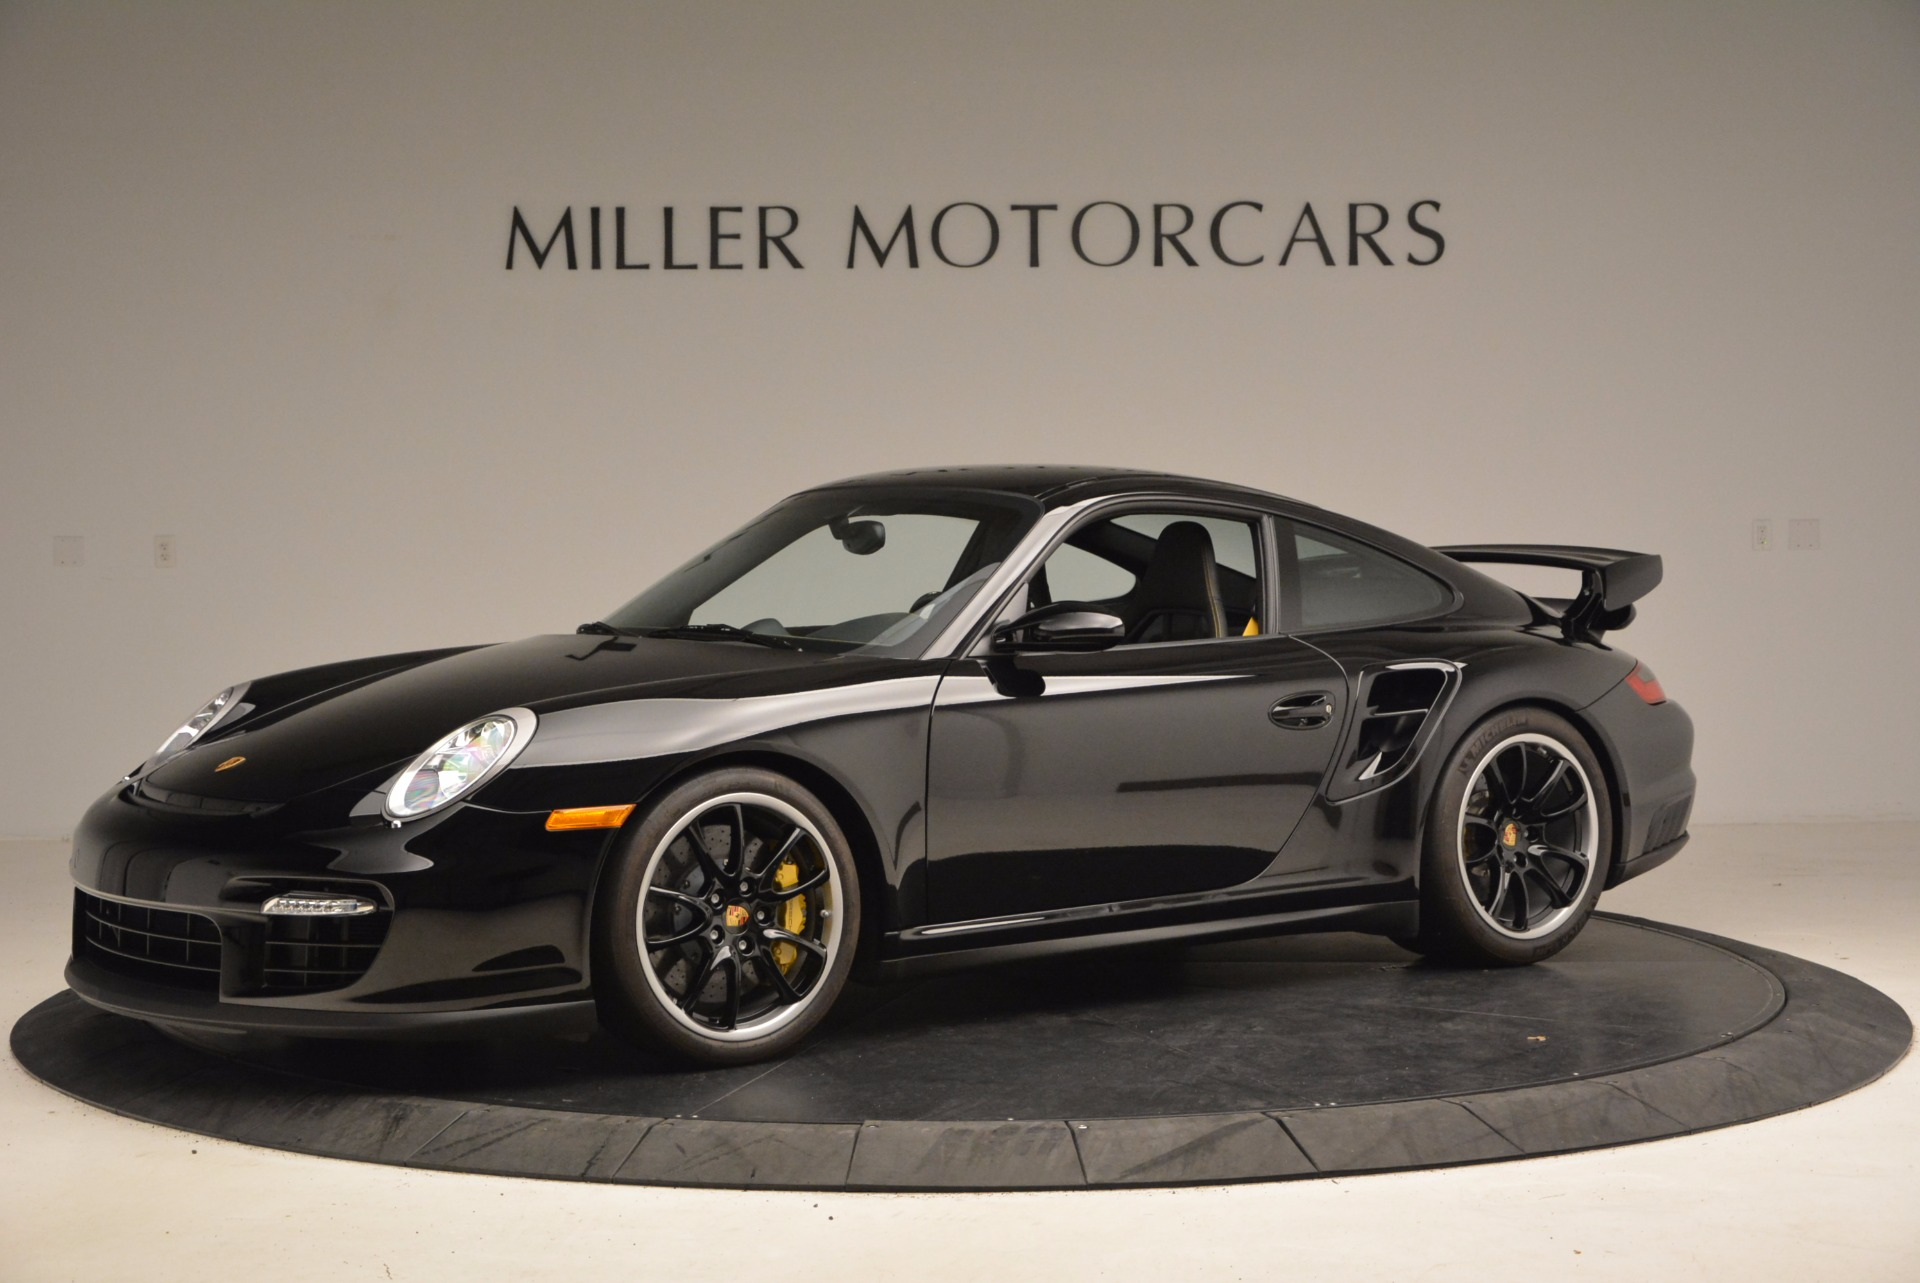 Used 2008 Porsche 911 GT2 For Sale In Greenwich, CT. Alfa Romeo of Greenwich, 7239 1400_p2